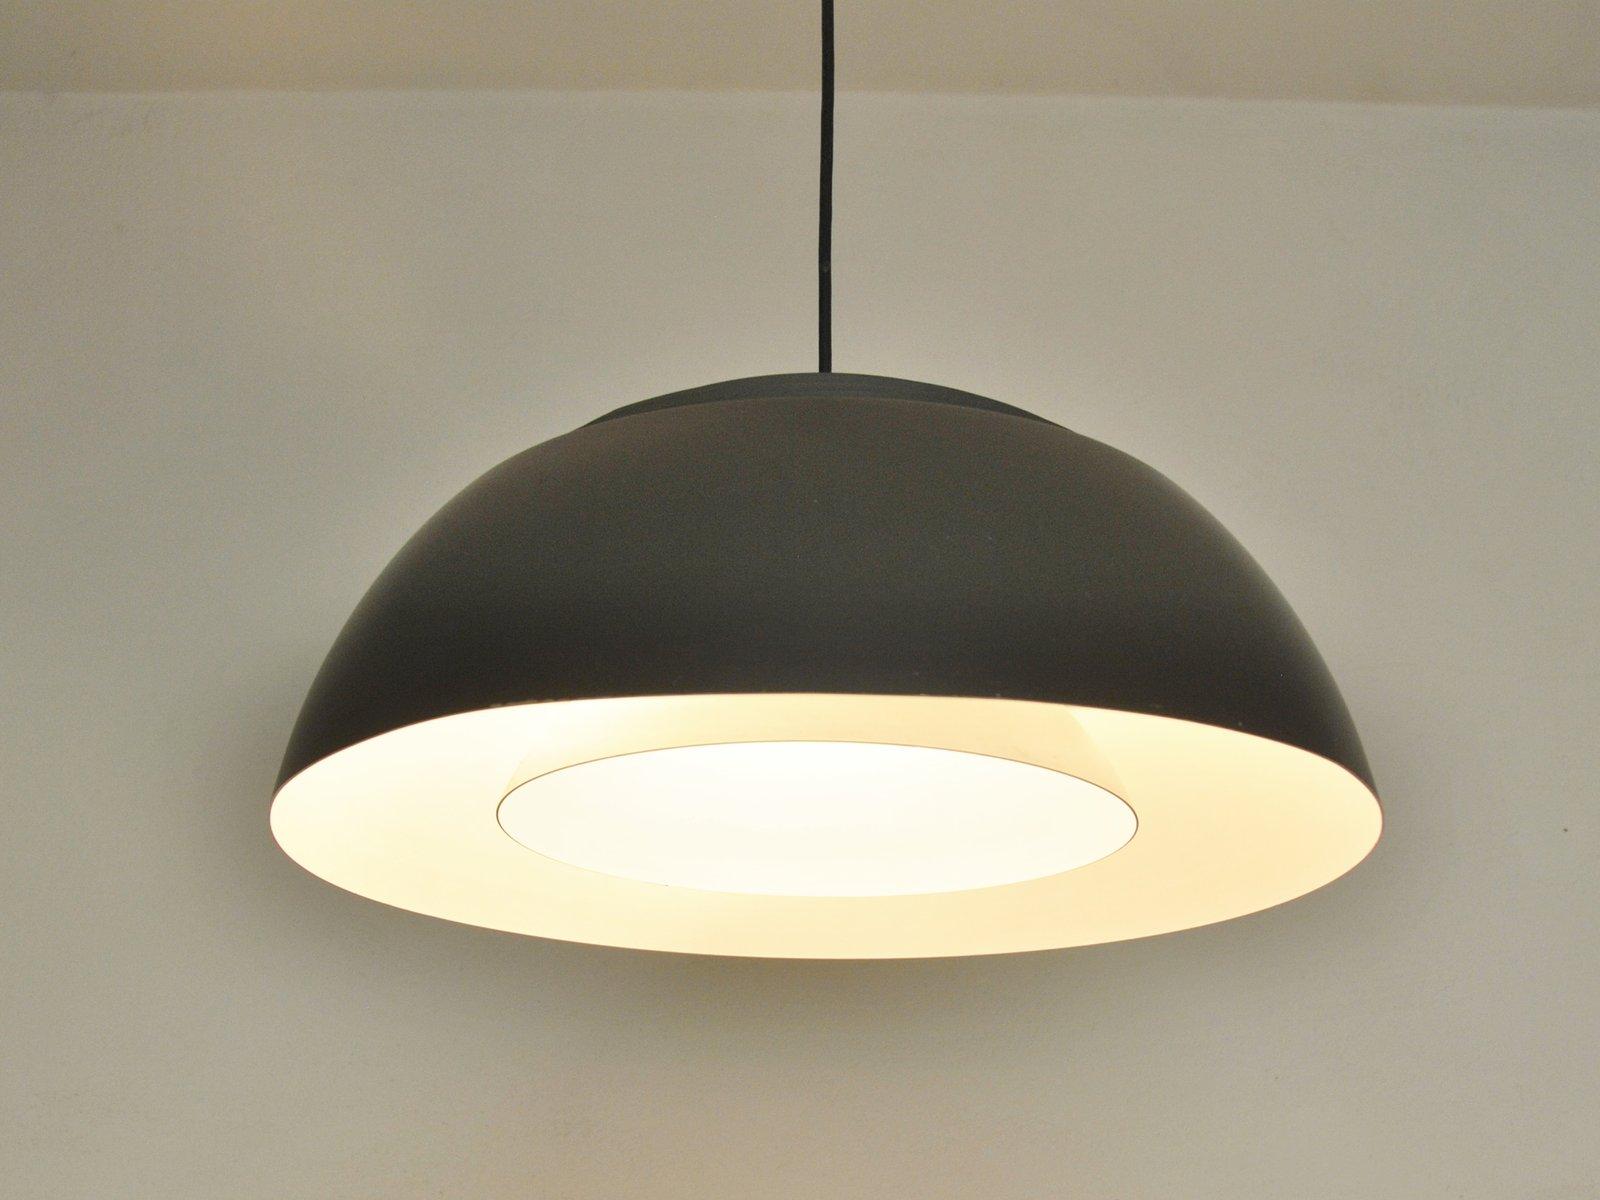 Brown AJ Royal Lamp by Arne Jacobsen for Louis Poulsen for sale at ...